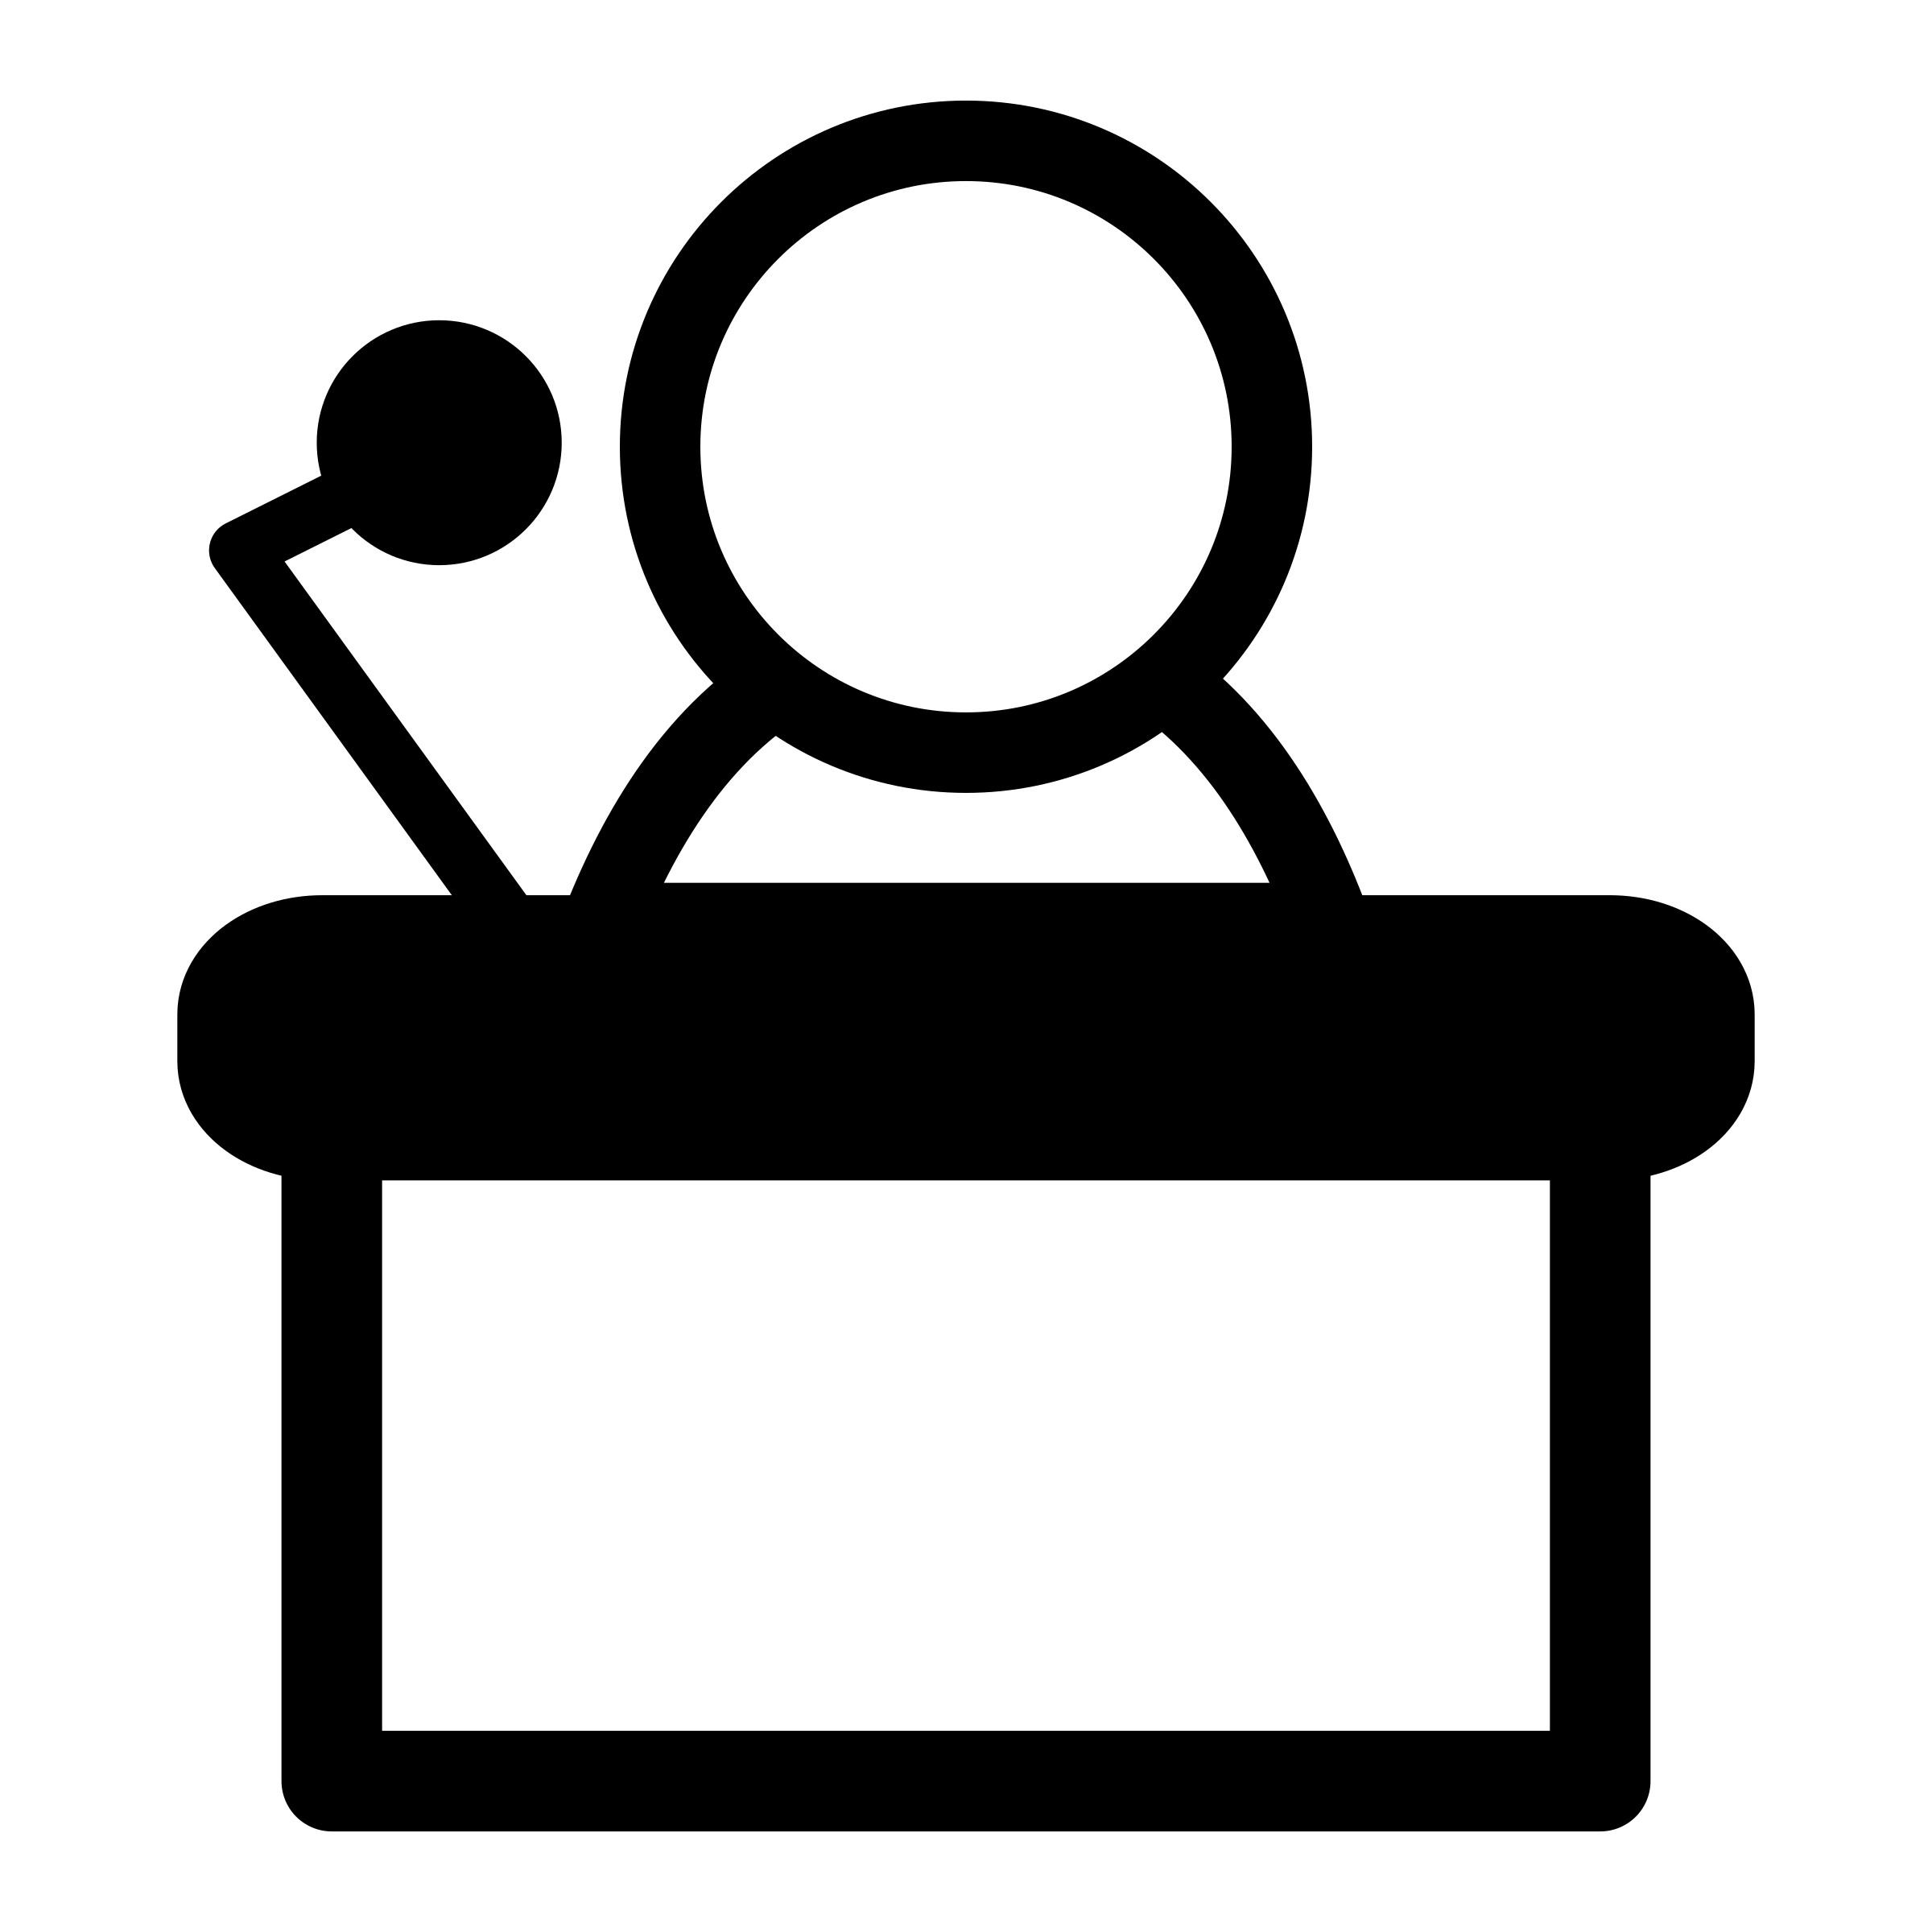 Clipart mono scheme presentation